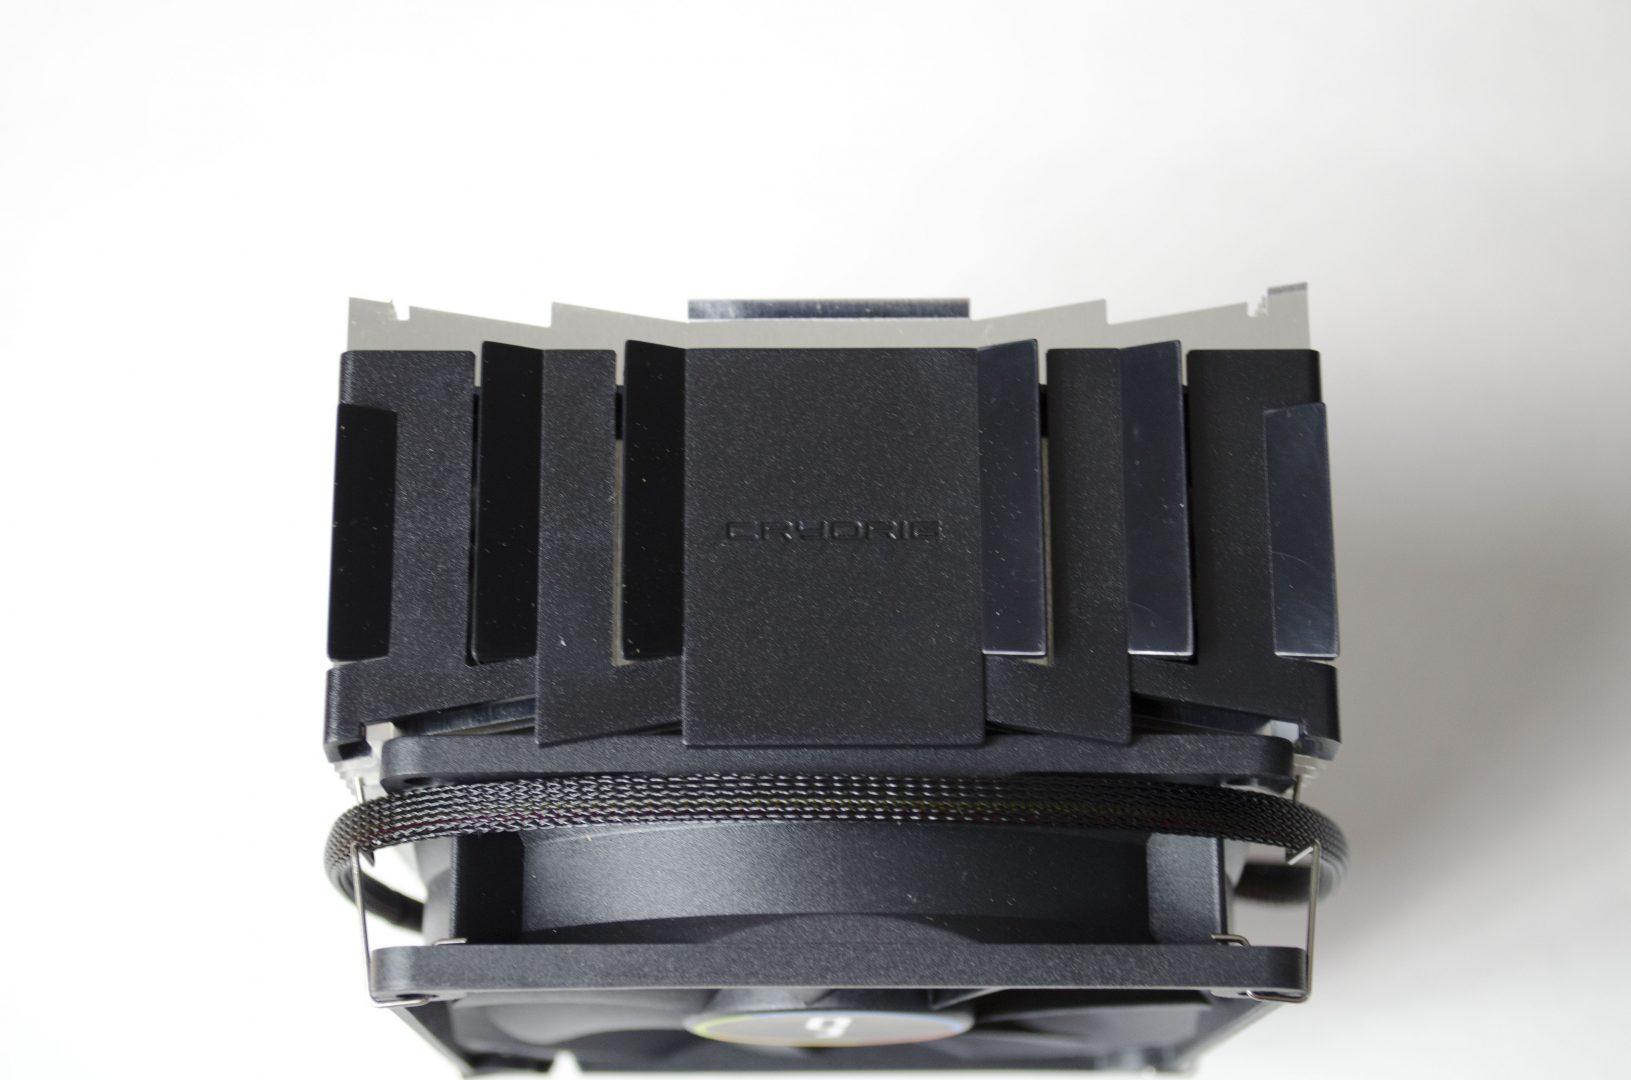 cryorig m9i cpu cooler review_4